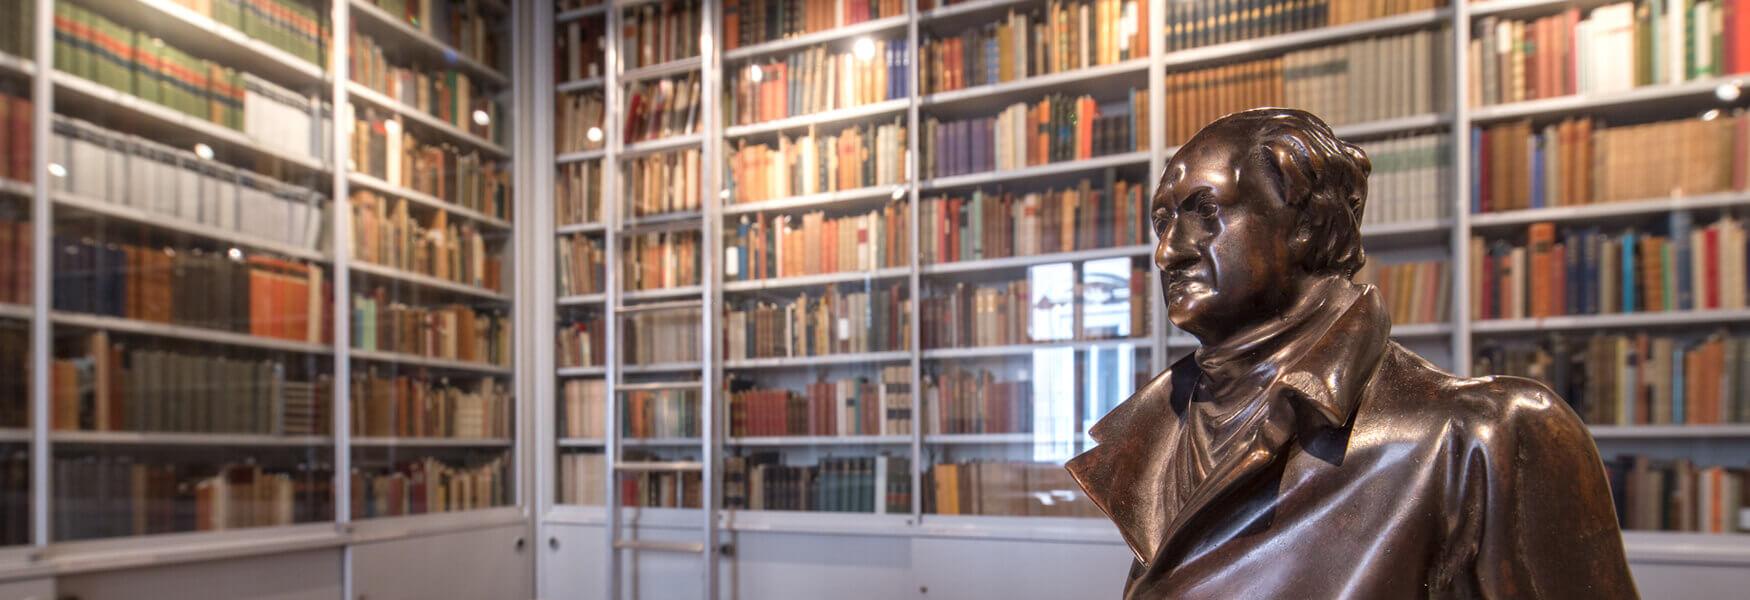 Casa di Goethe Bibliotheken